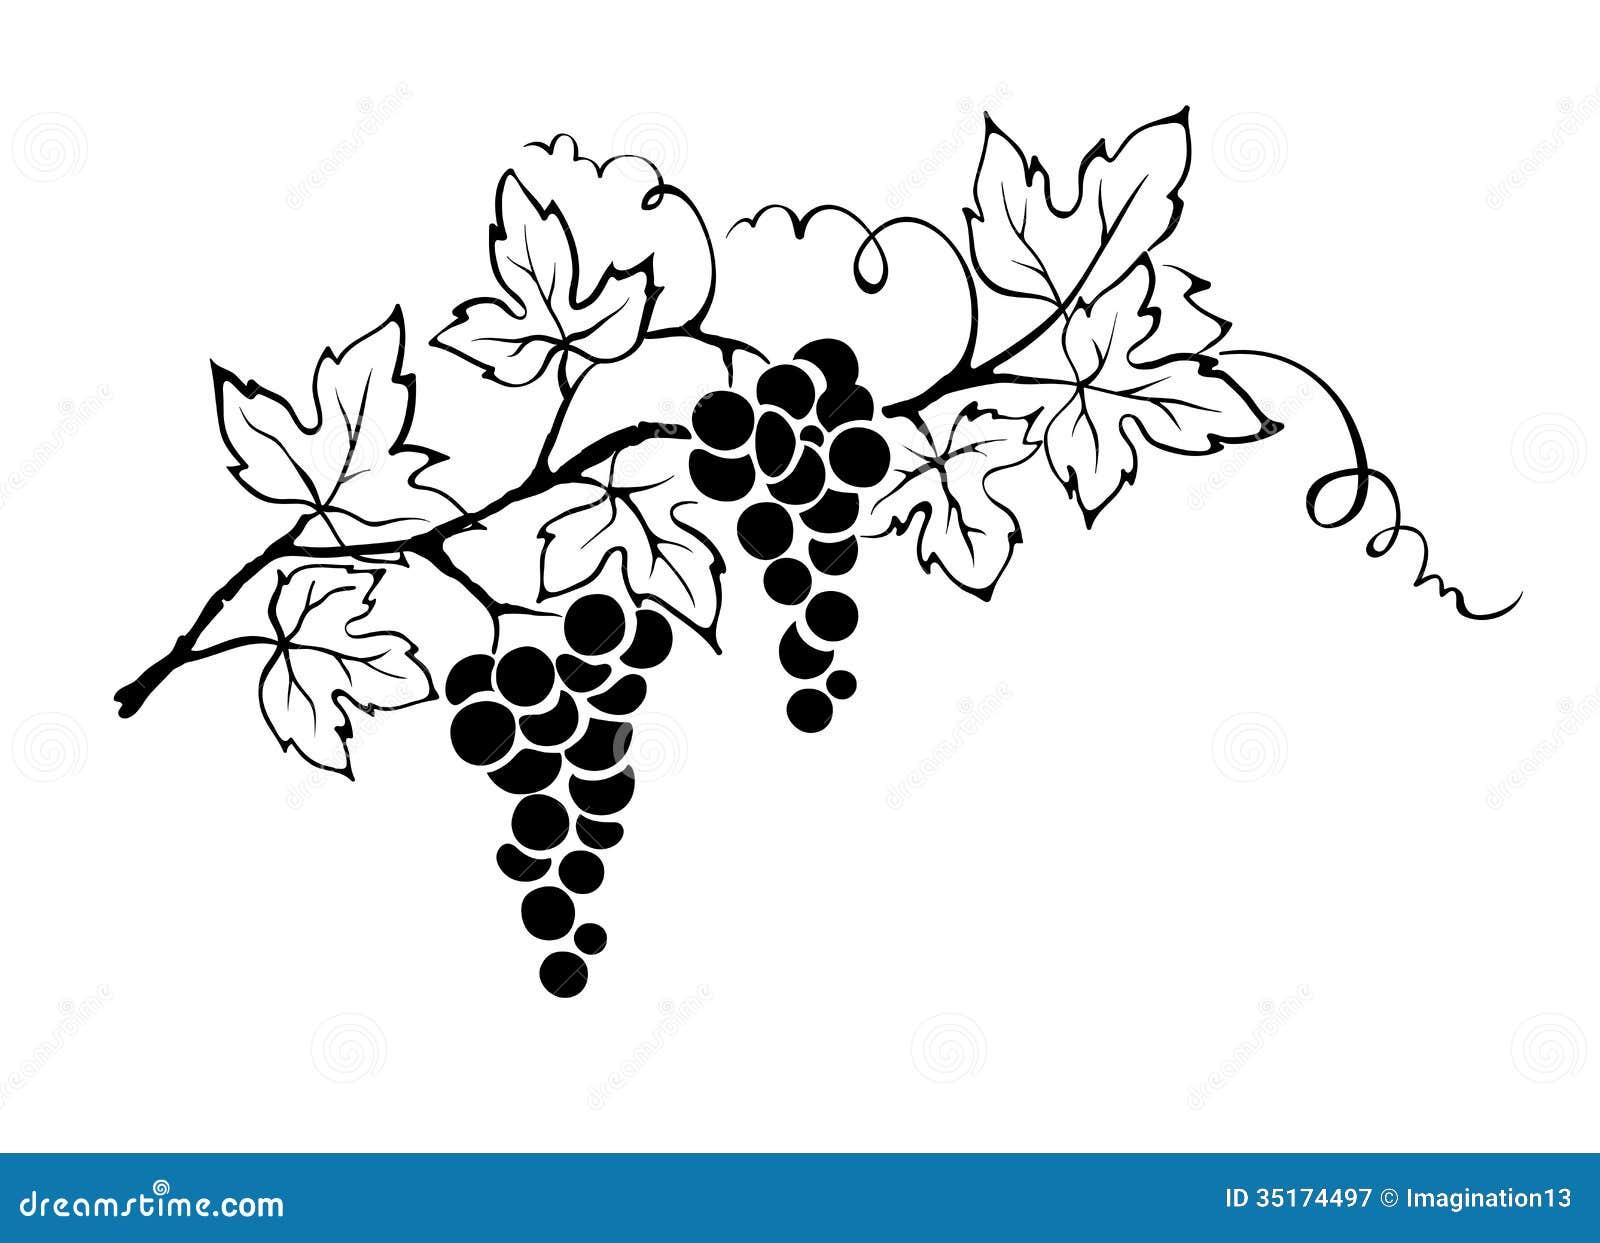 Grapevine stock vector. Illustration of gourmet ...